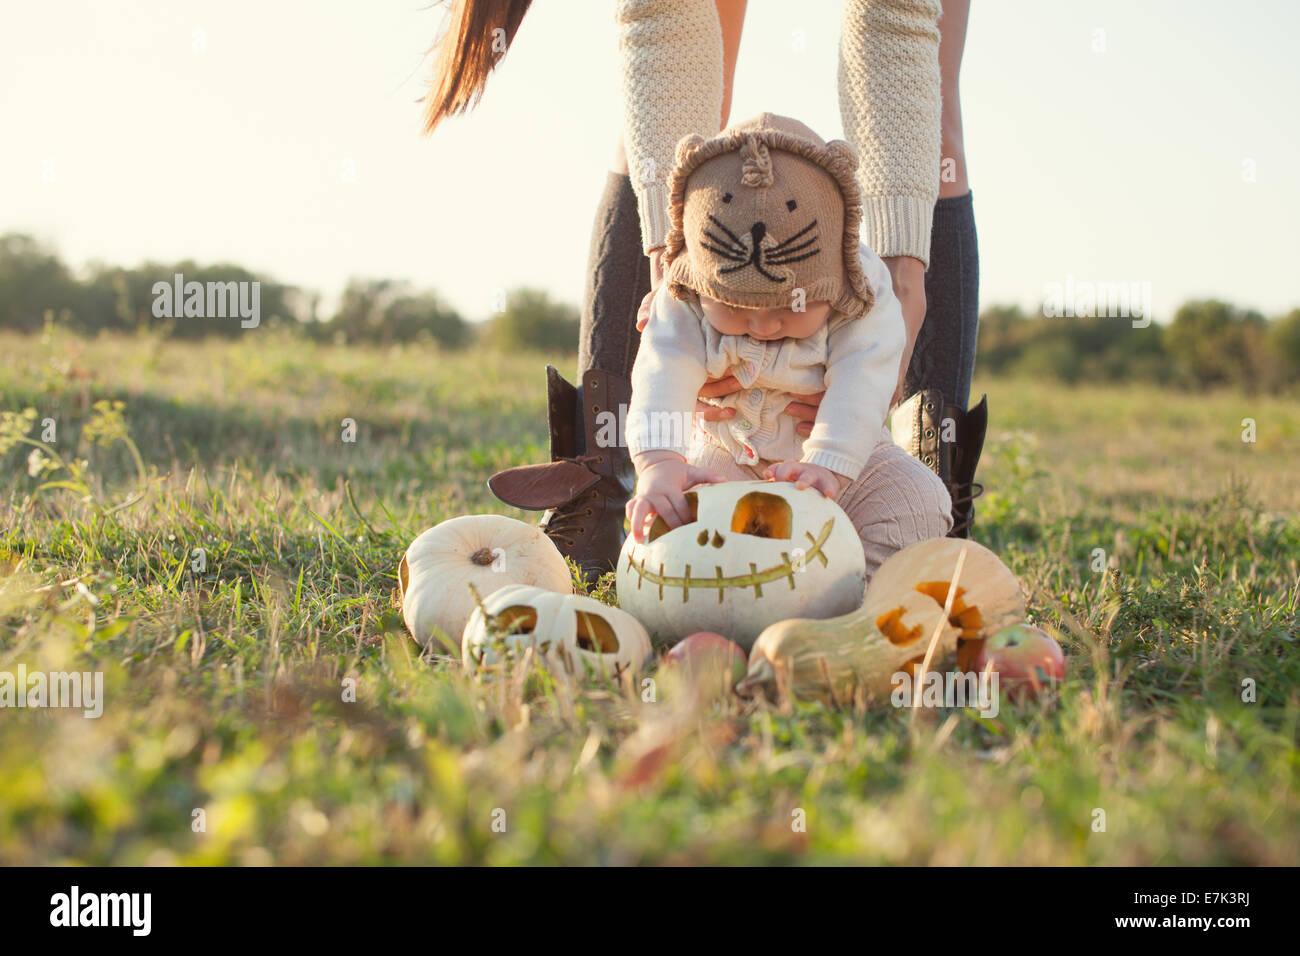 Wenig baby sehen Halloweenkürbis erstmals Stockbild